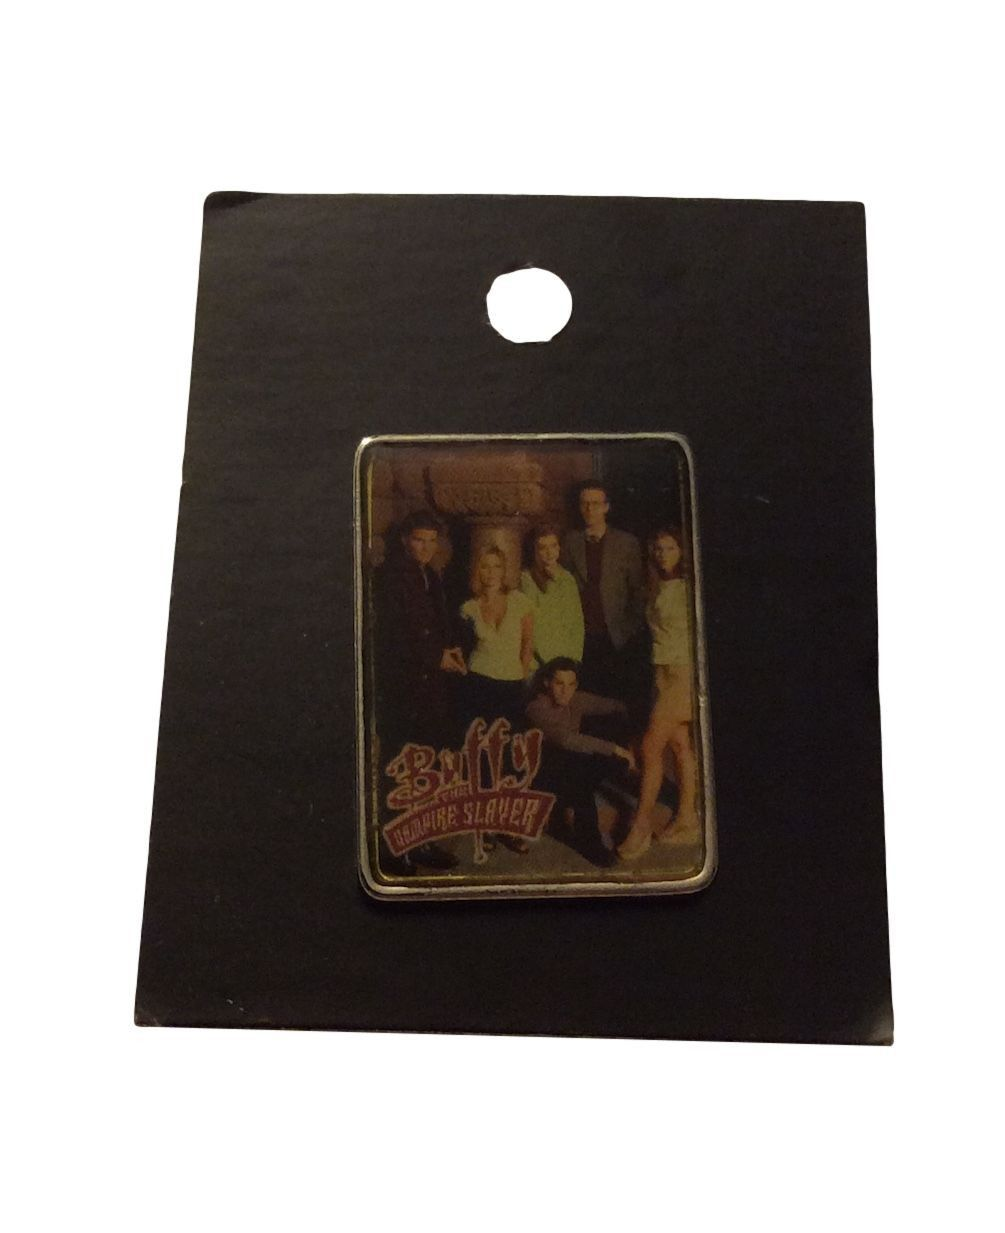 Buffy The Vampire Slayer Photo Enamel Metal Pin Licensed